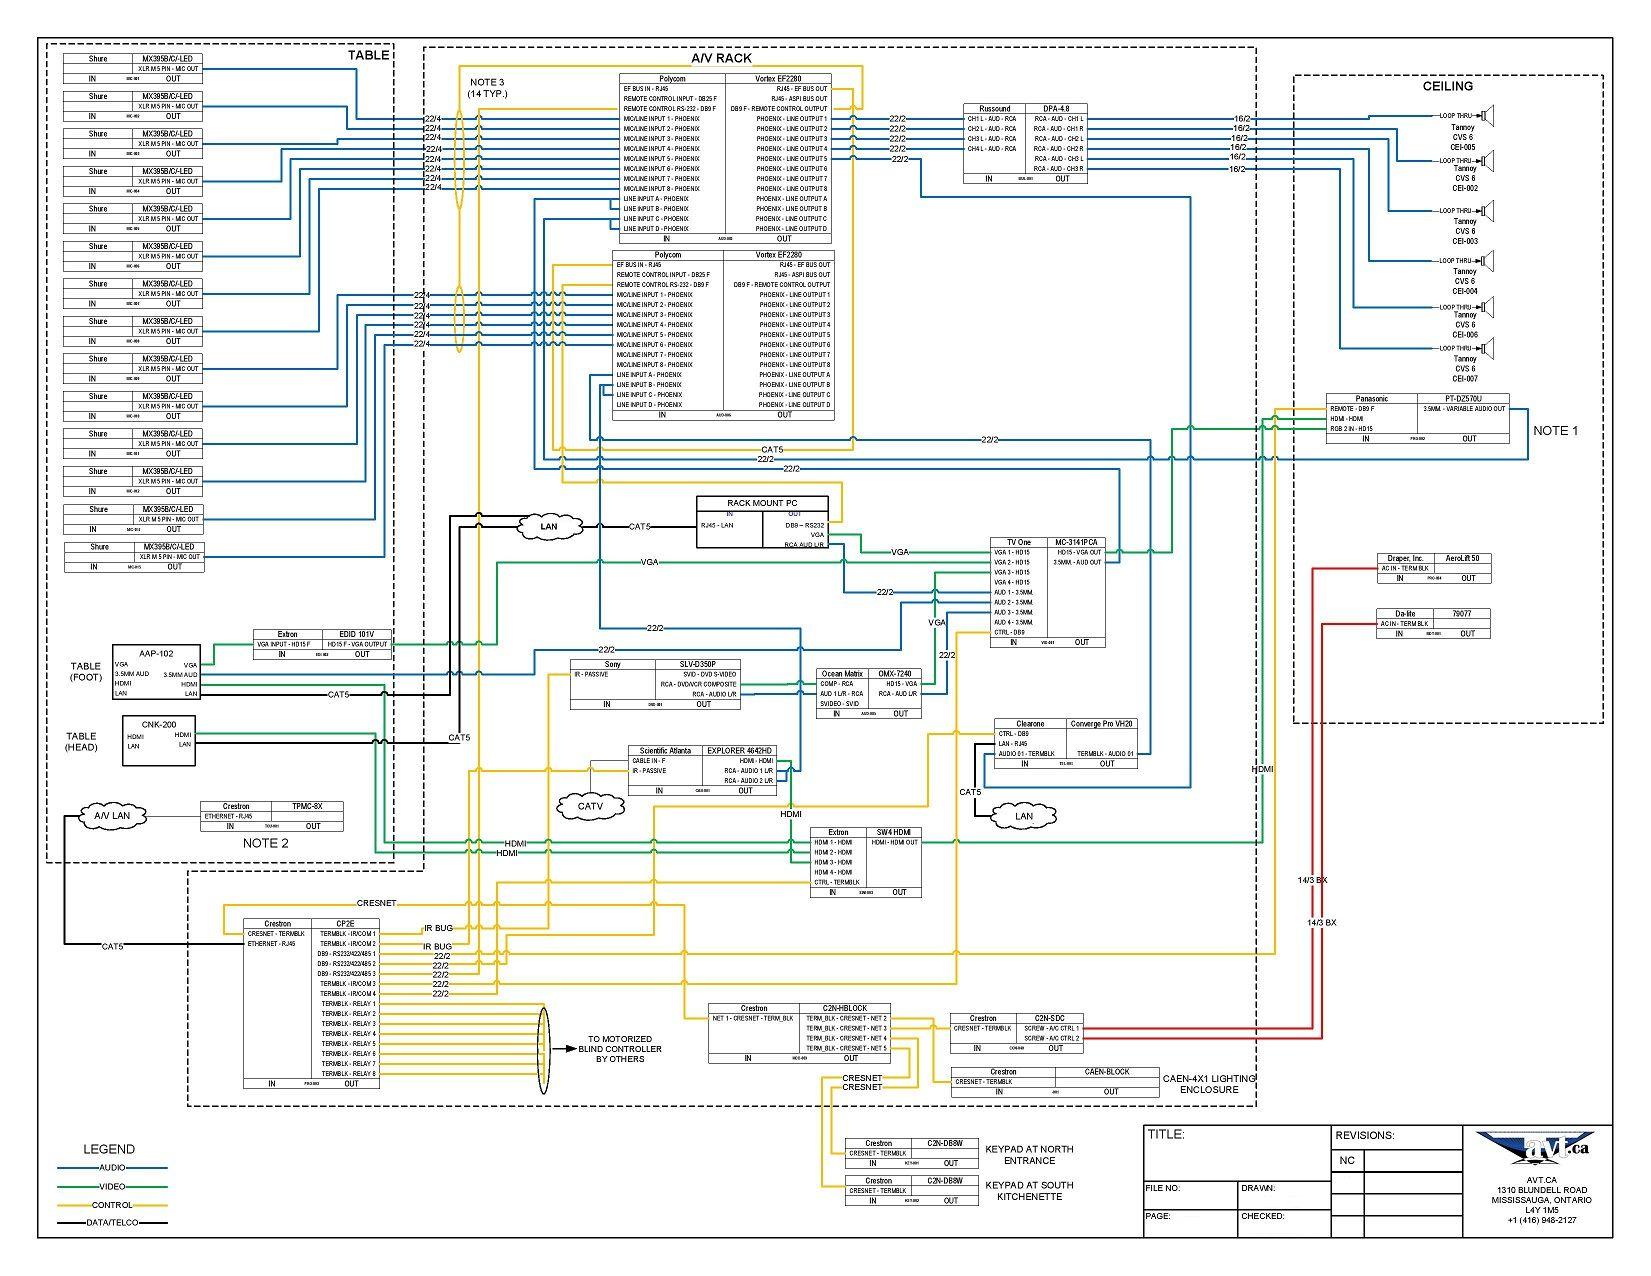 home automation wiring plan list of schematic circuit diagram u2022 iat diagram 6 wire 2014 kia soul [ 1651 x 1276 Pixel ]